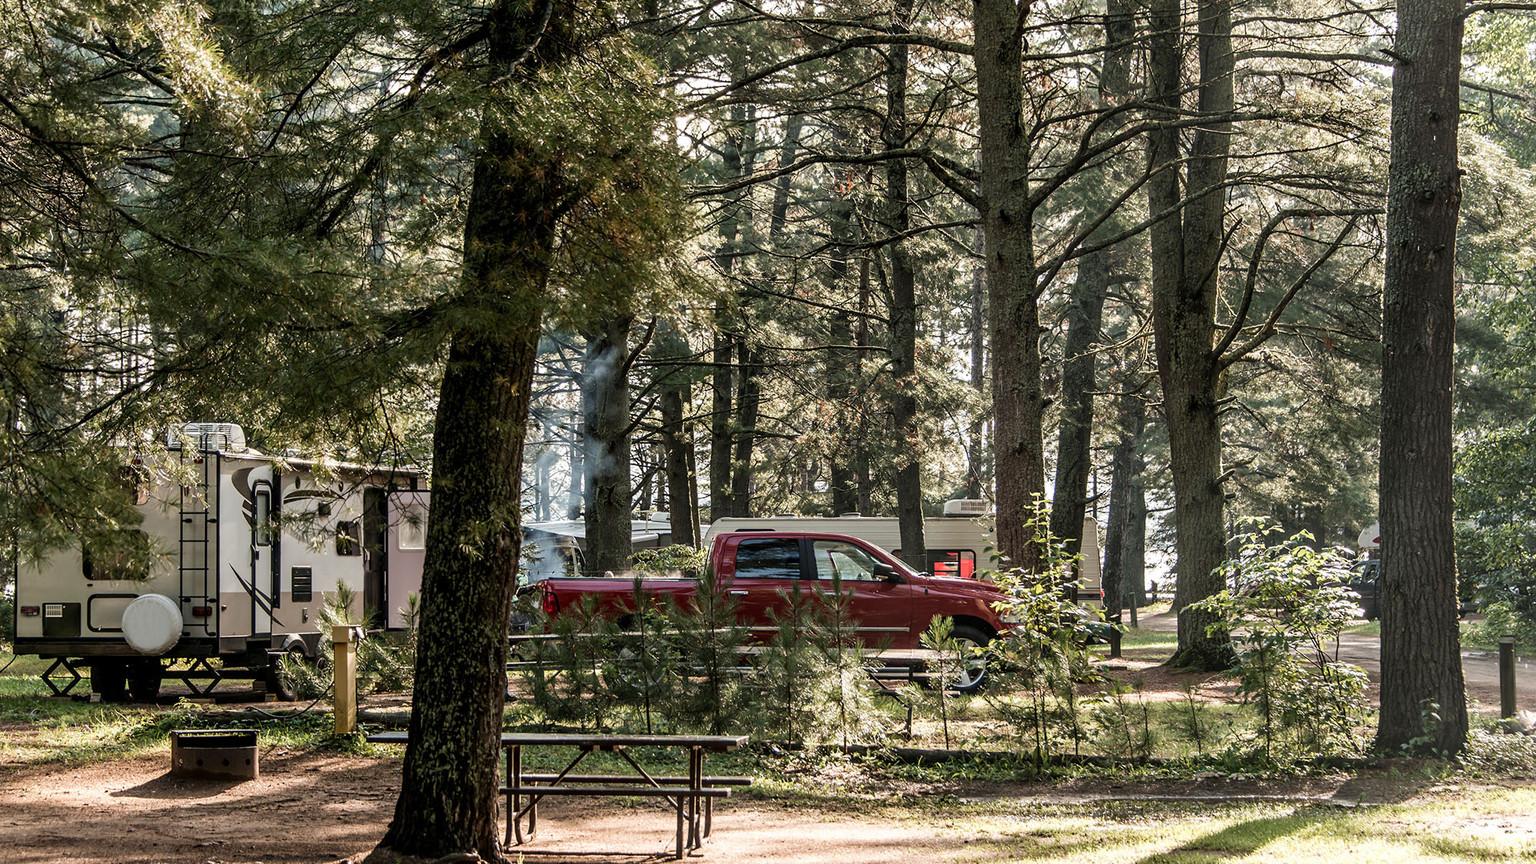 serviced RV lot campsites